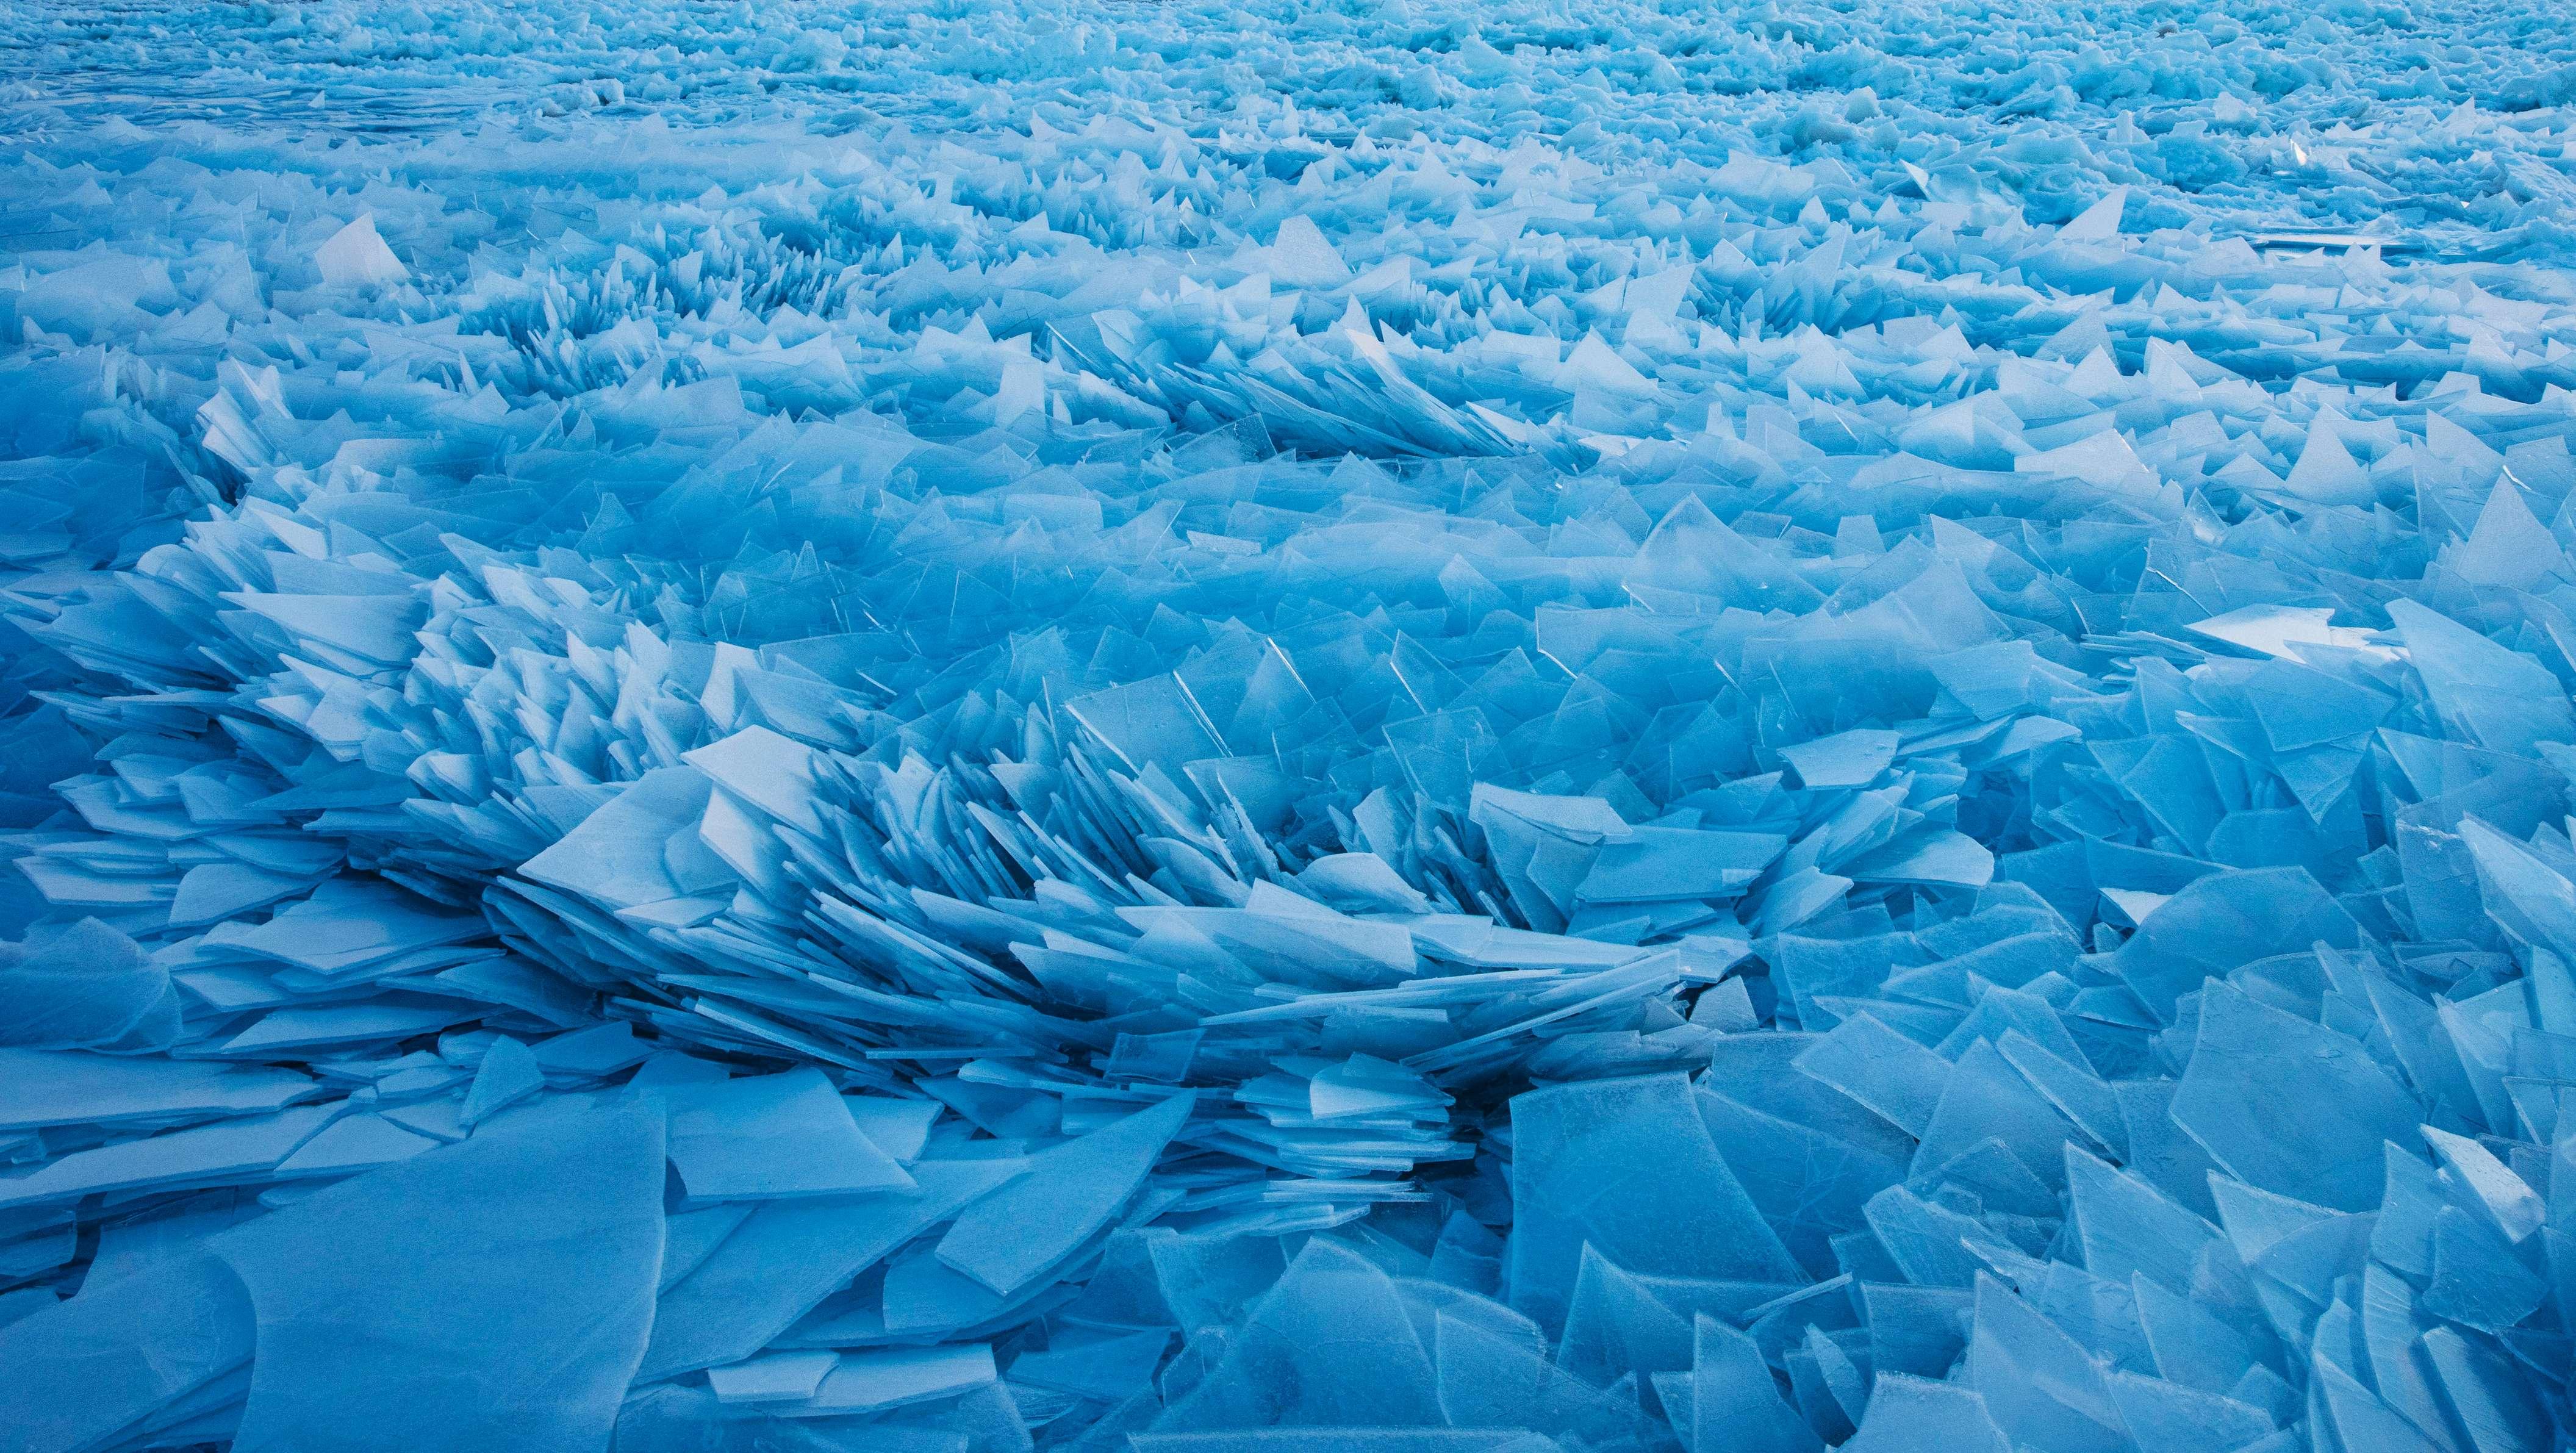 Shards of ice, Lake Michigan